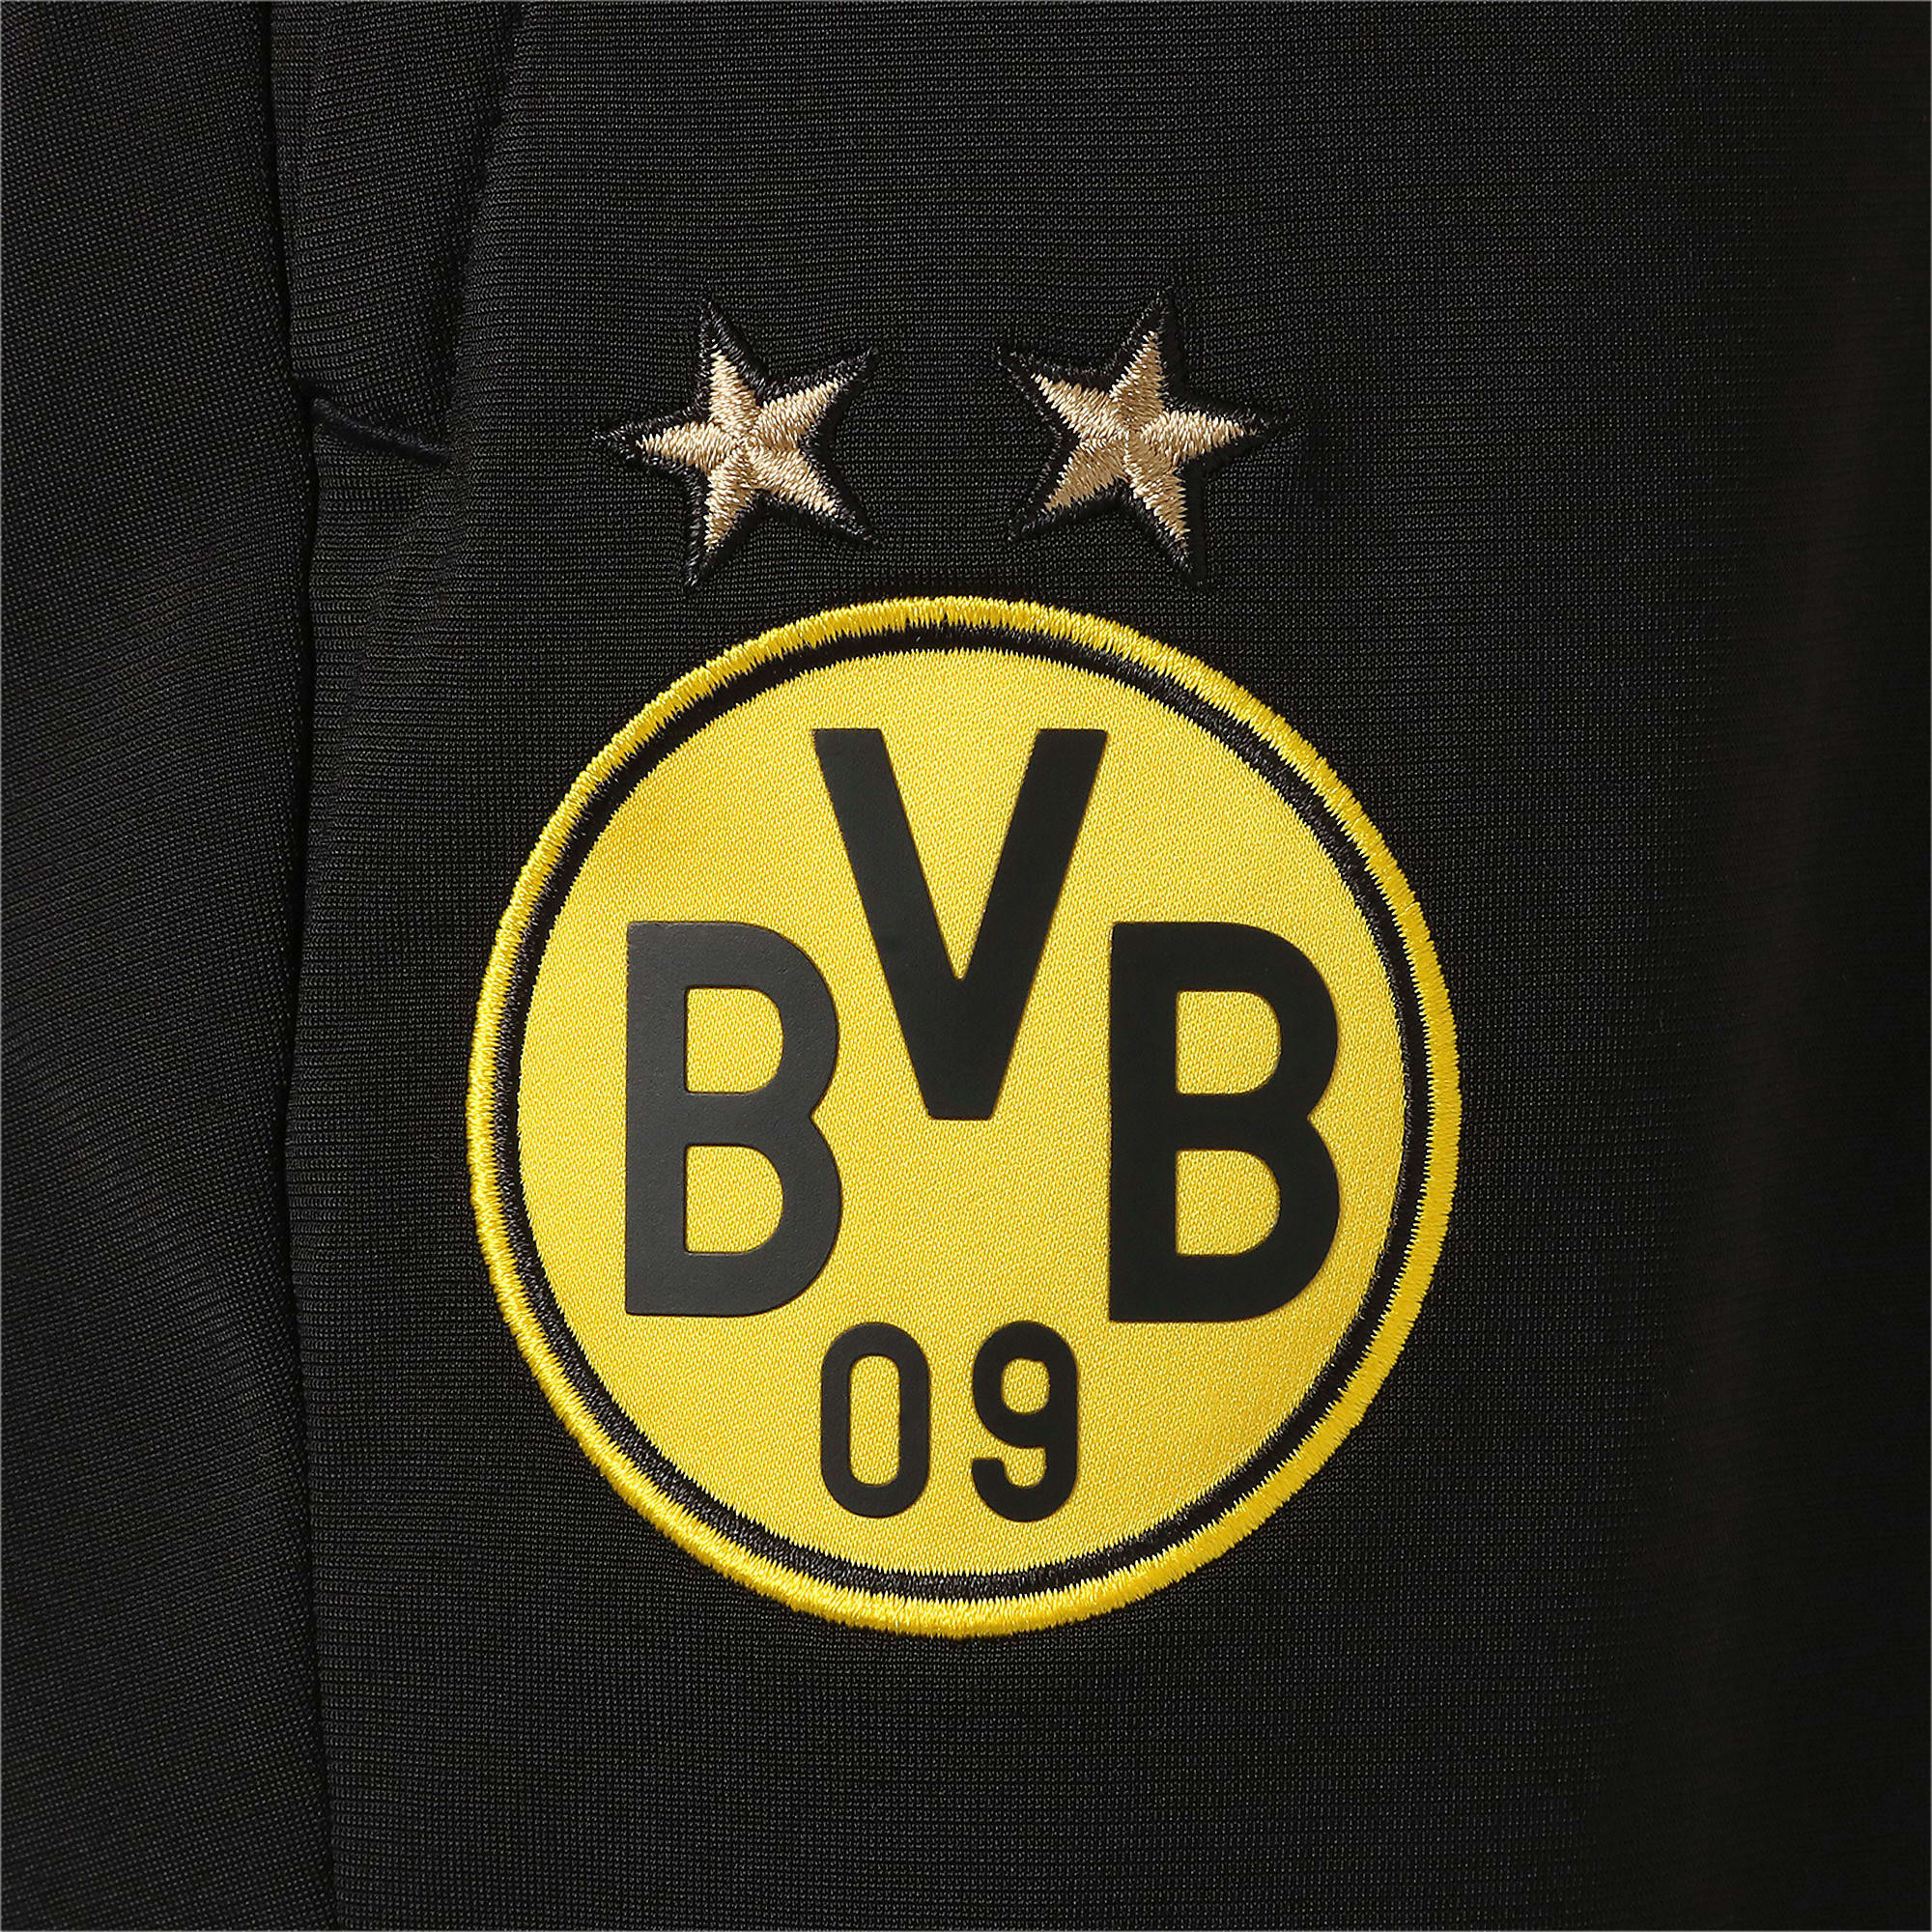 Thumbnail 10 of ドルトムント BVB トレーニング パンツ, Puma Black-Cyber Yellow, medium-JPN